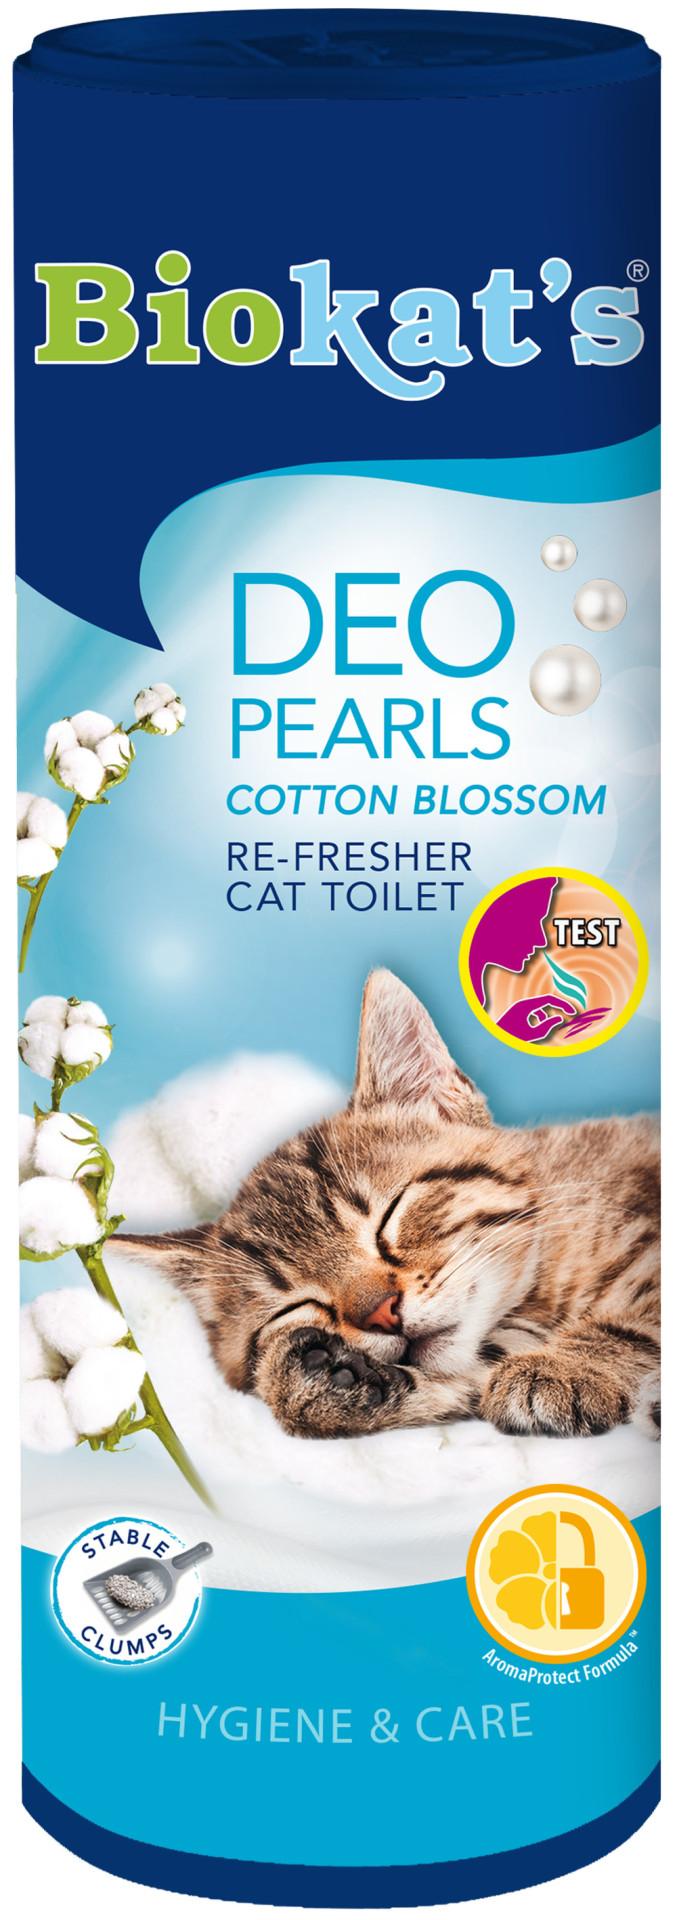 Biokat's Deo Pearls Cotton Blossom 700 gr